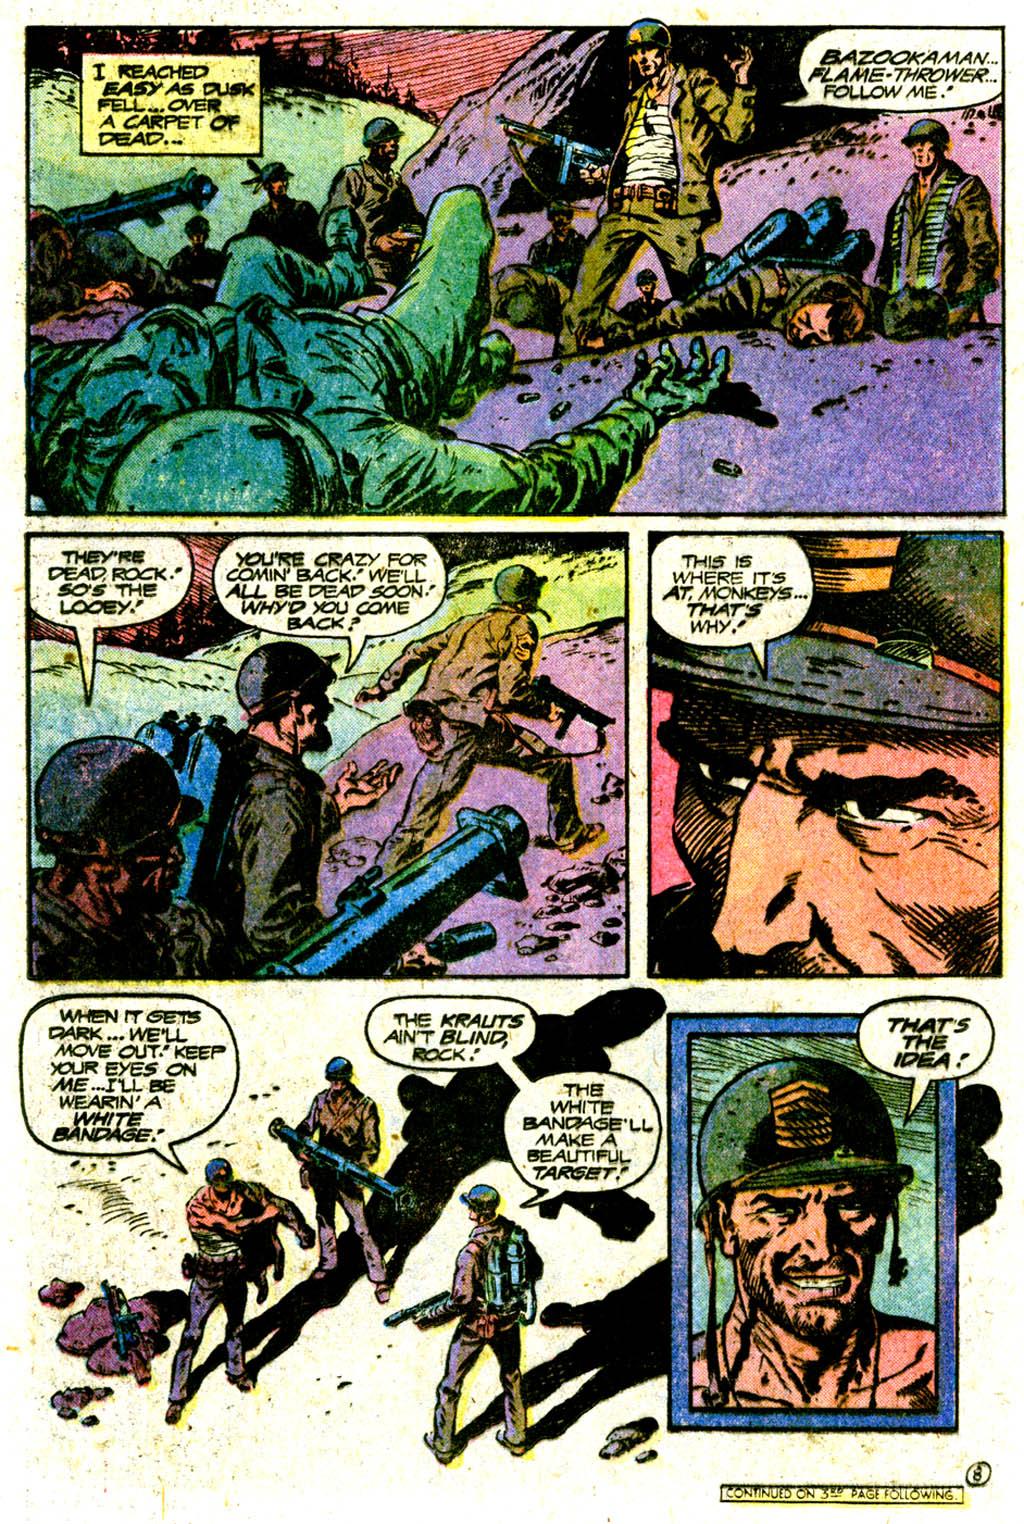 Read online Sgt. Rock comic -  Issue #334 - 11